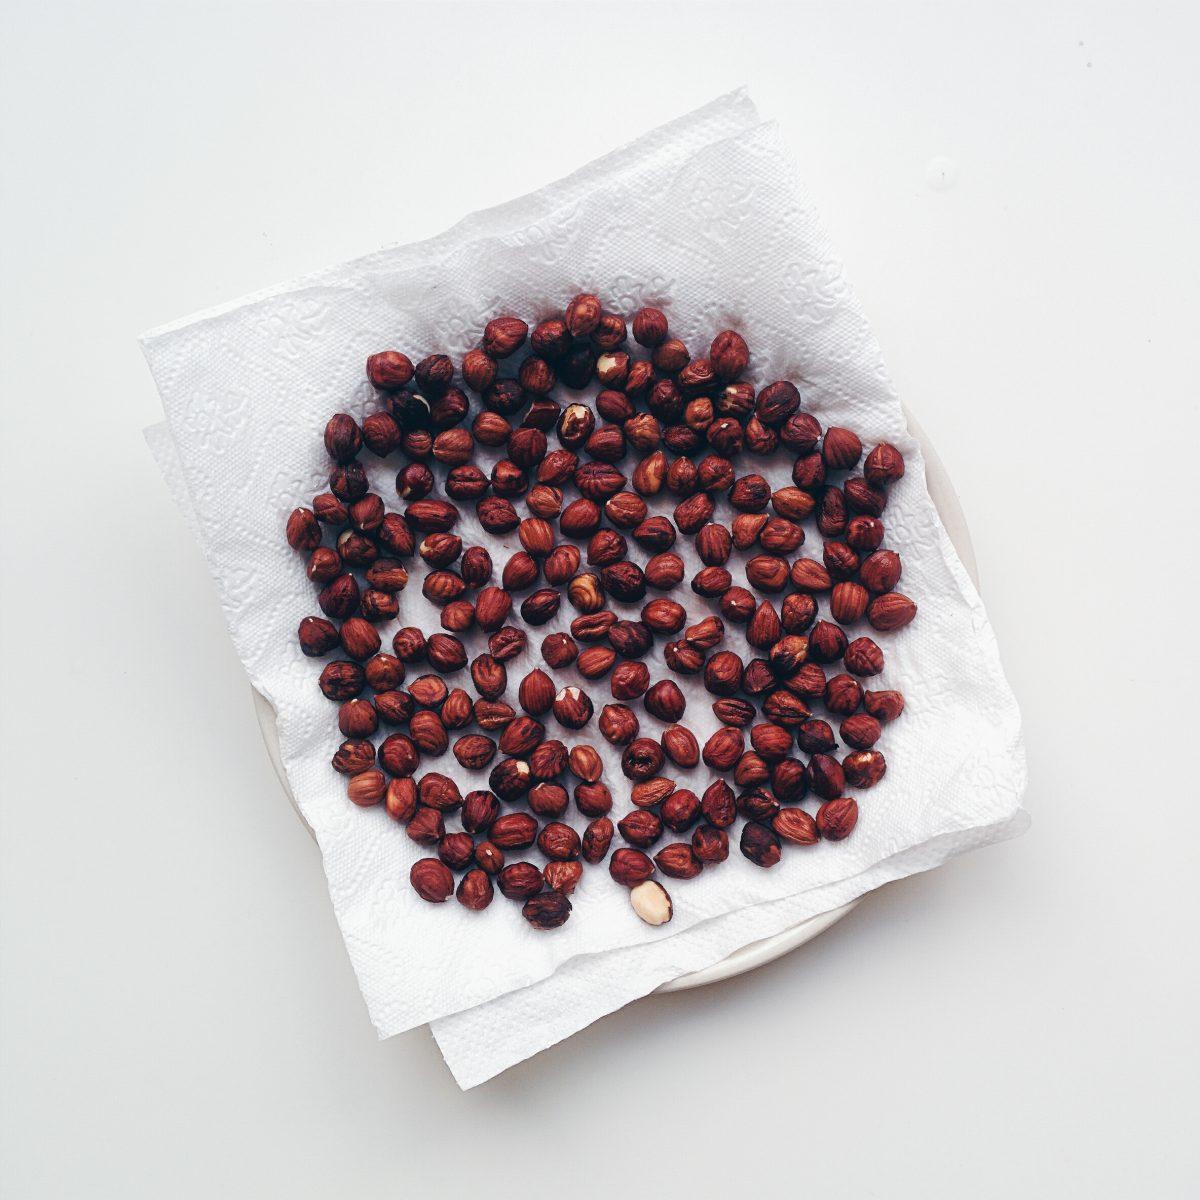 Drying hazelnuts